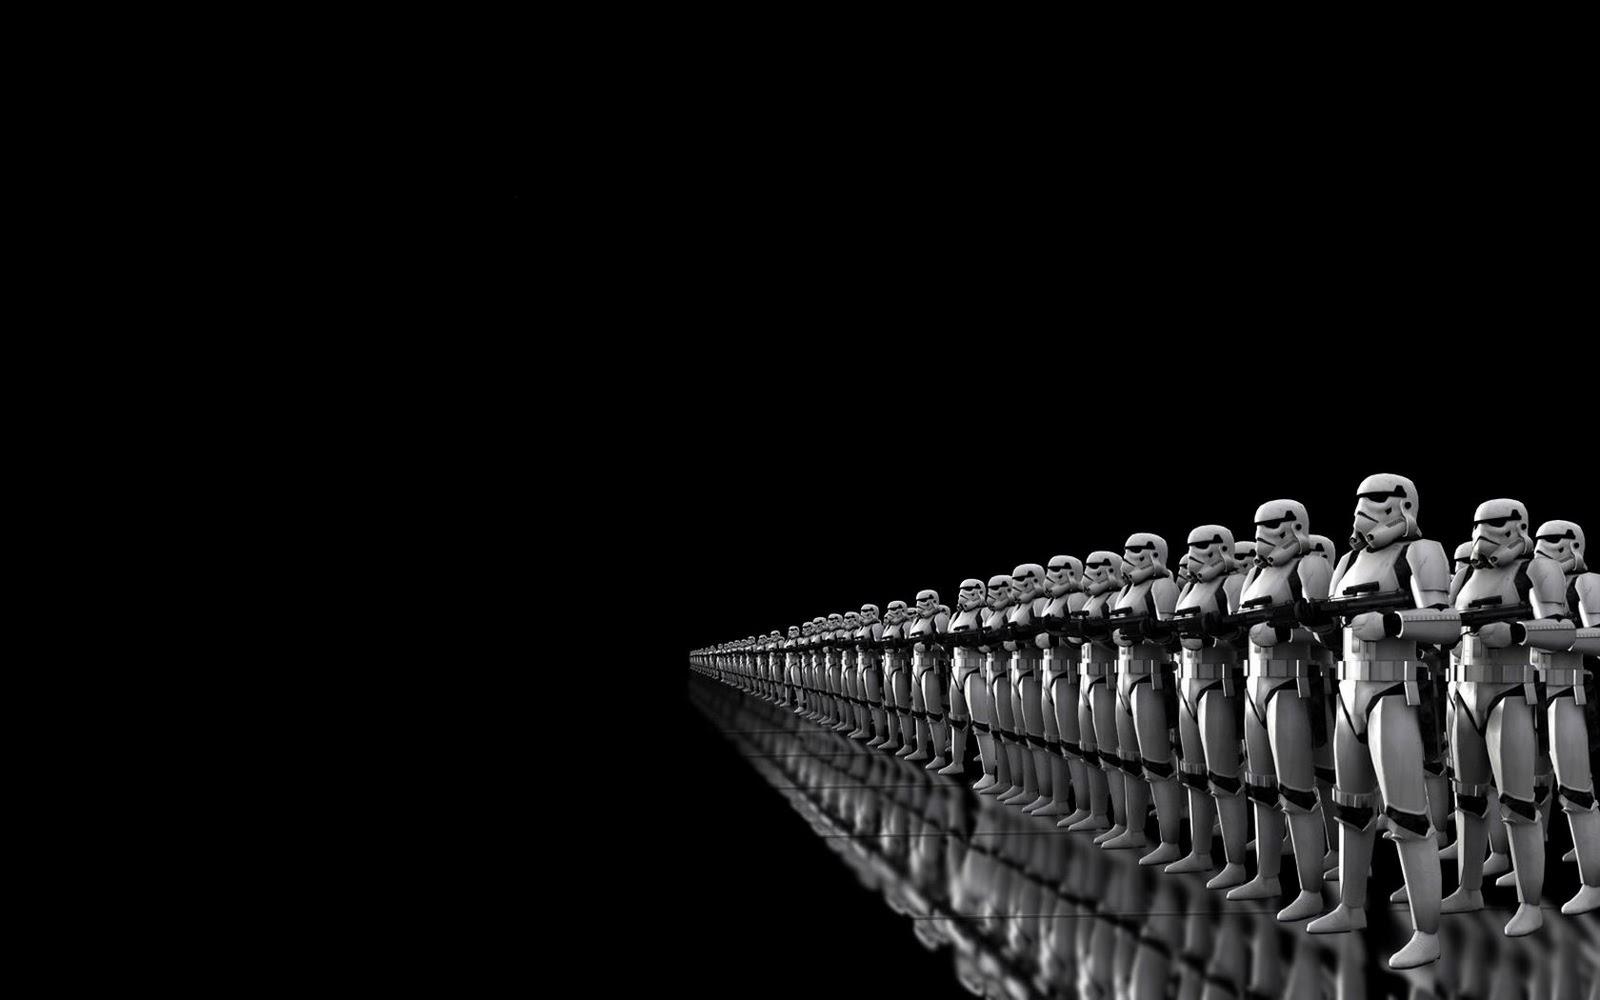 Free Download Star Wars Wallpaper 28jpg 1600x1000 For Your Desktop Mobile Tablet Explore 49 Star Wars Phone Wallpaper Hd Hd Star Wars Wallpapers 1080p Star Wars Wallpapers Reddit Free